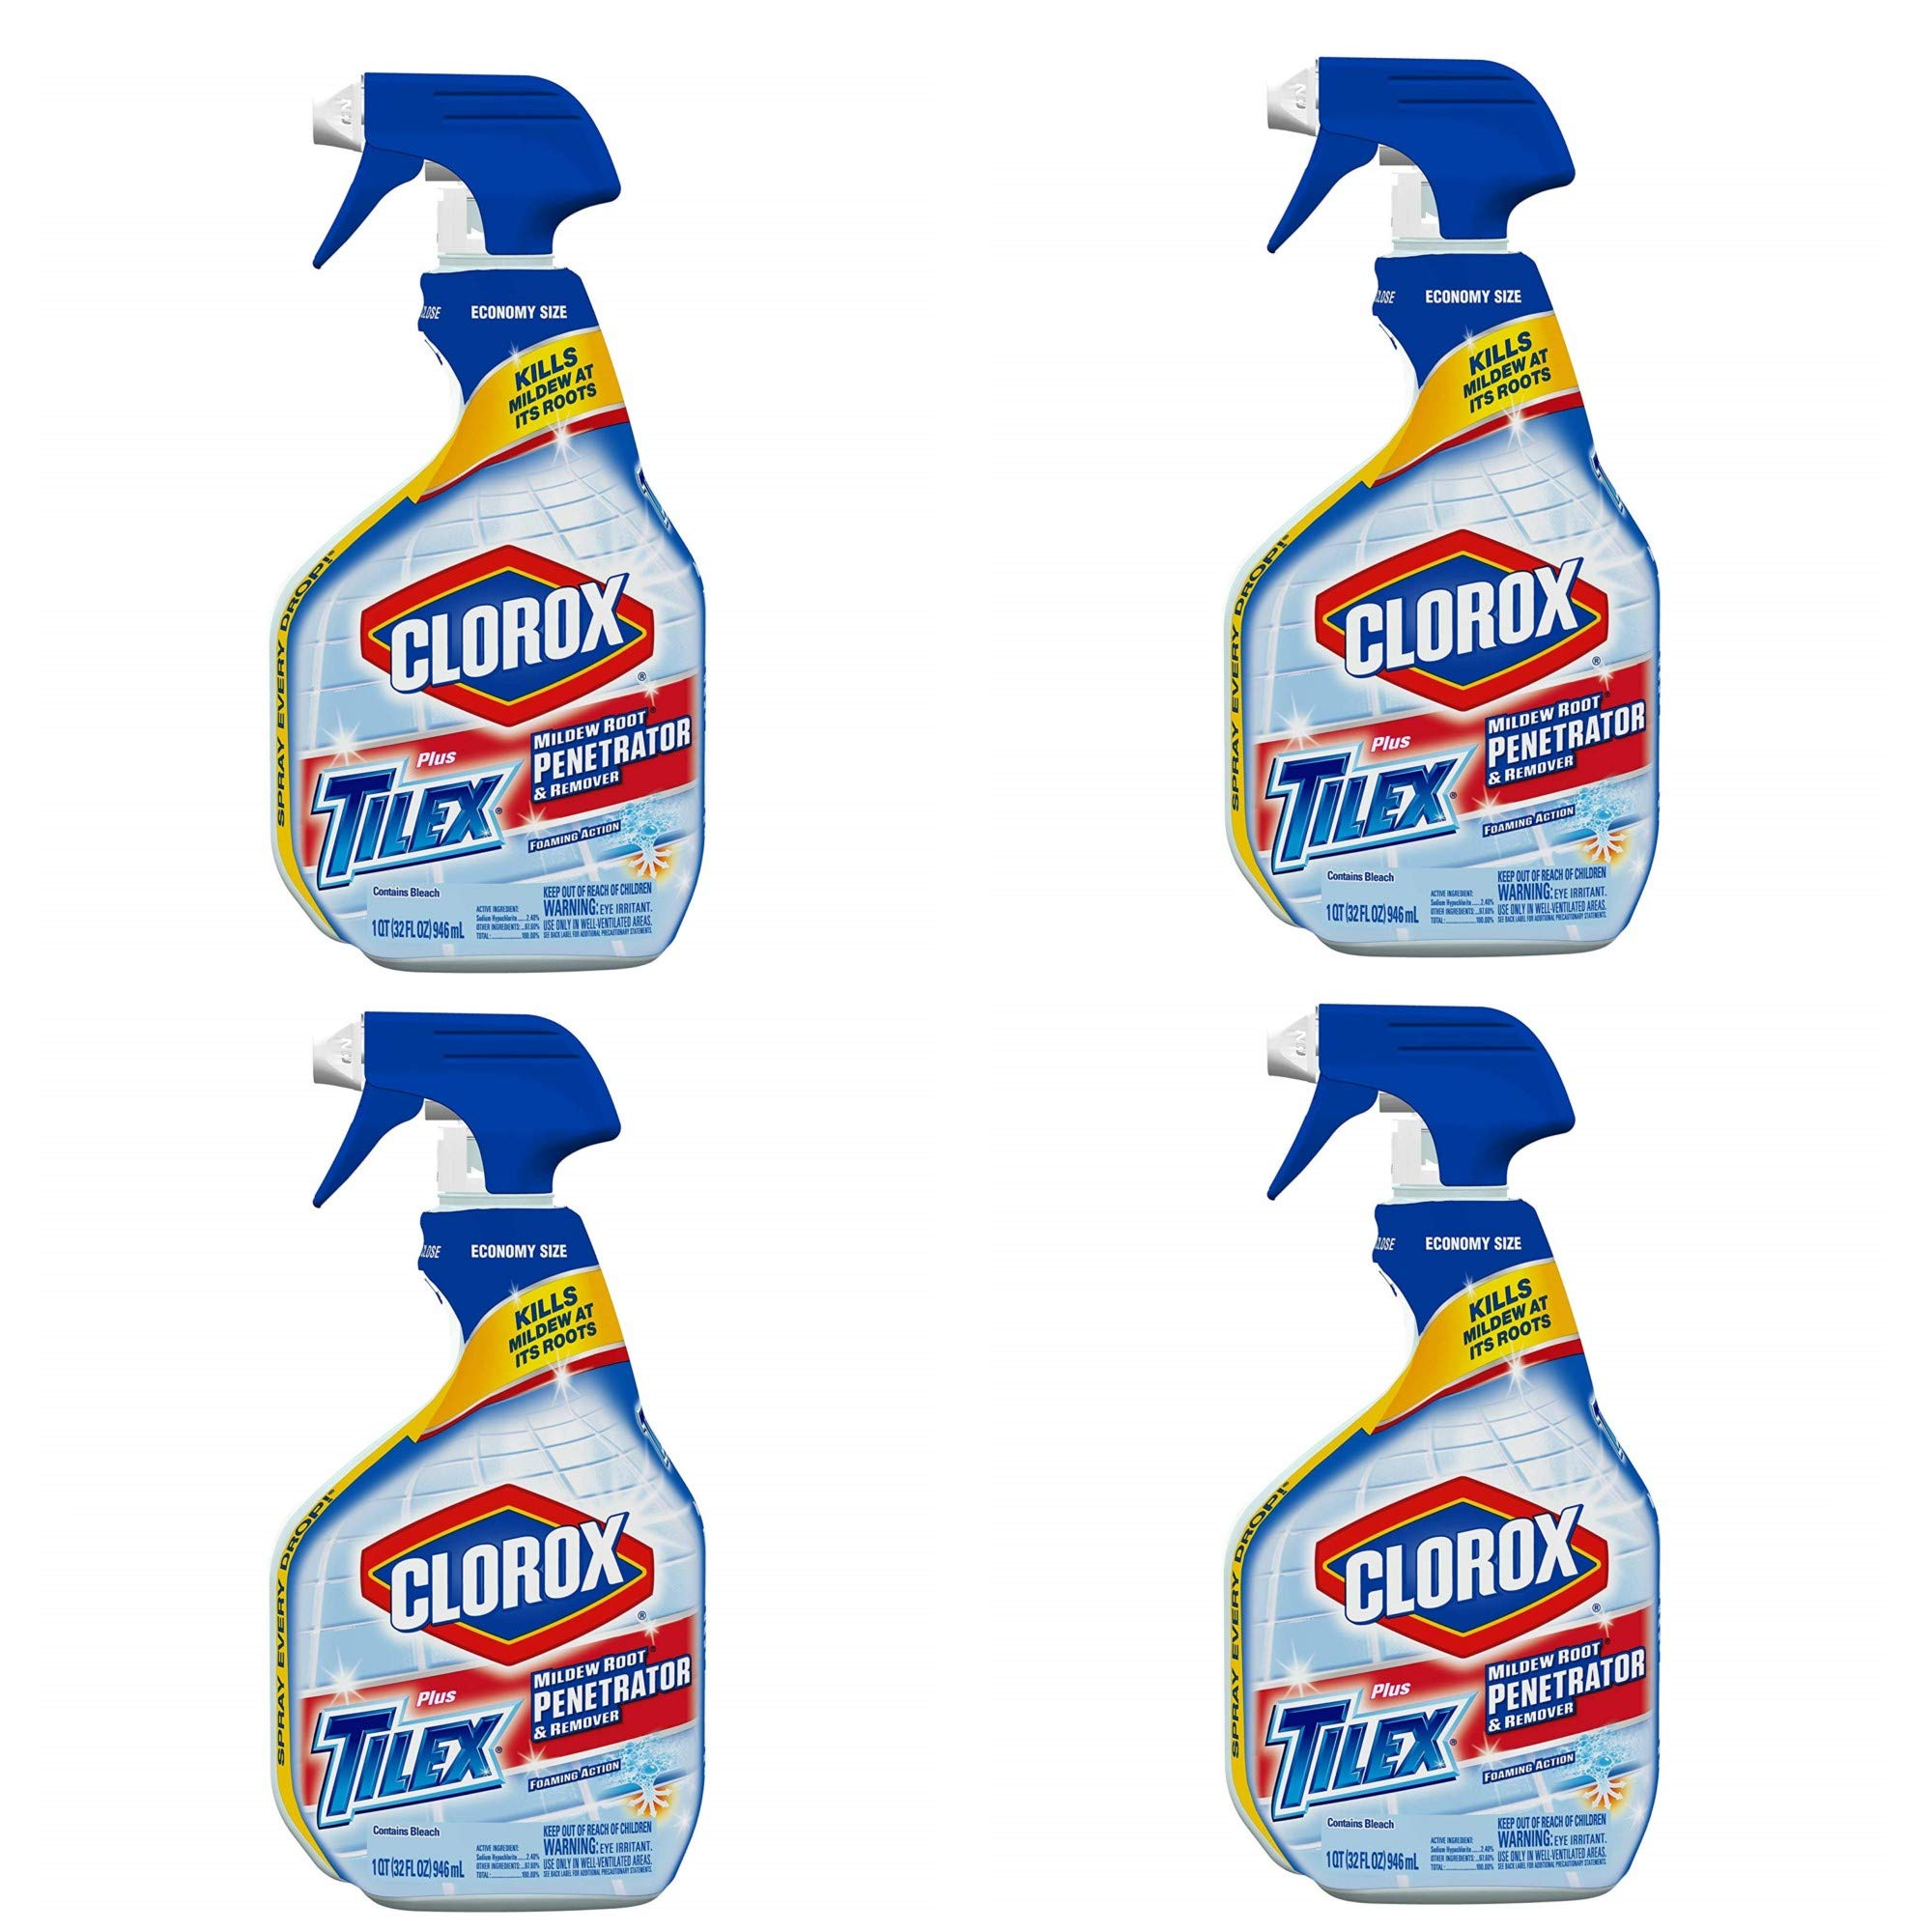 Tilex 00263 Mildew Root Penetrator and Remover Spray Bottle, 32 fl oz Trigger Spray Bottle (4) by Clorox